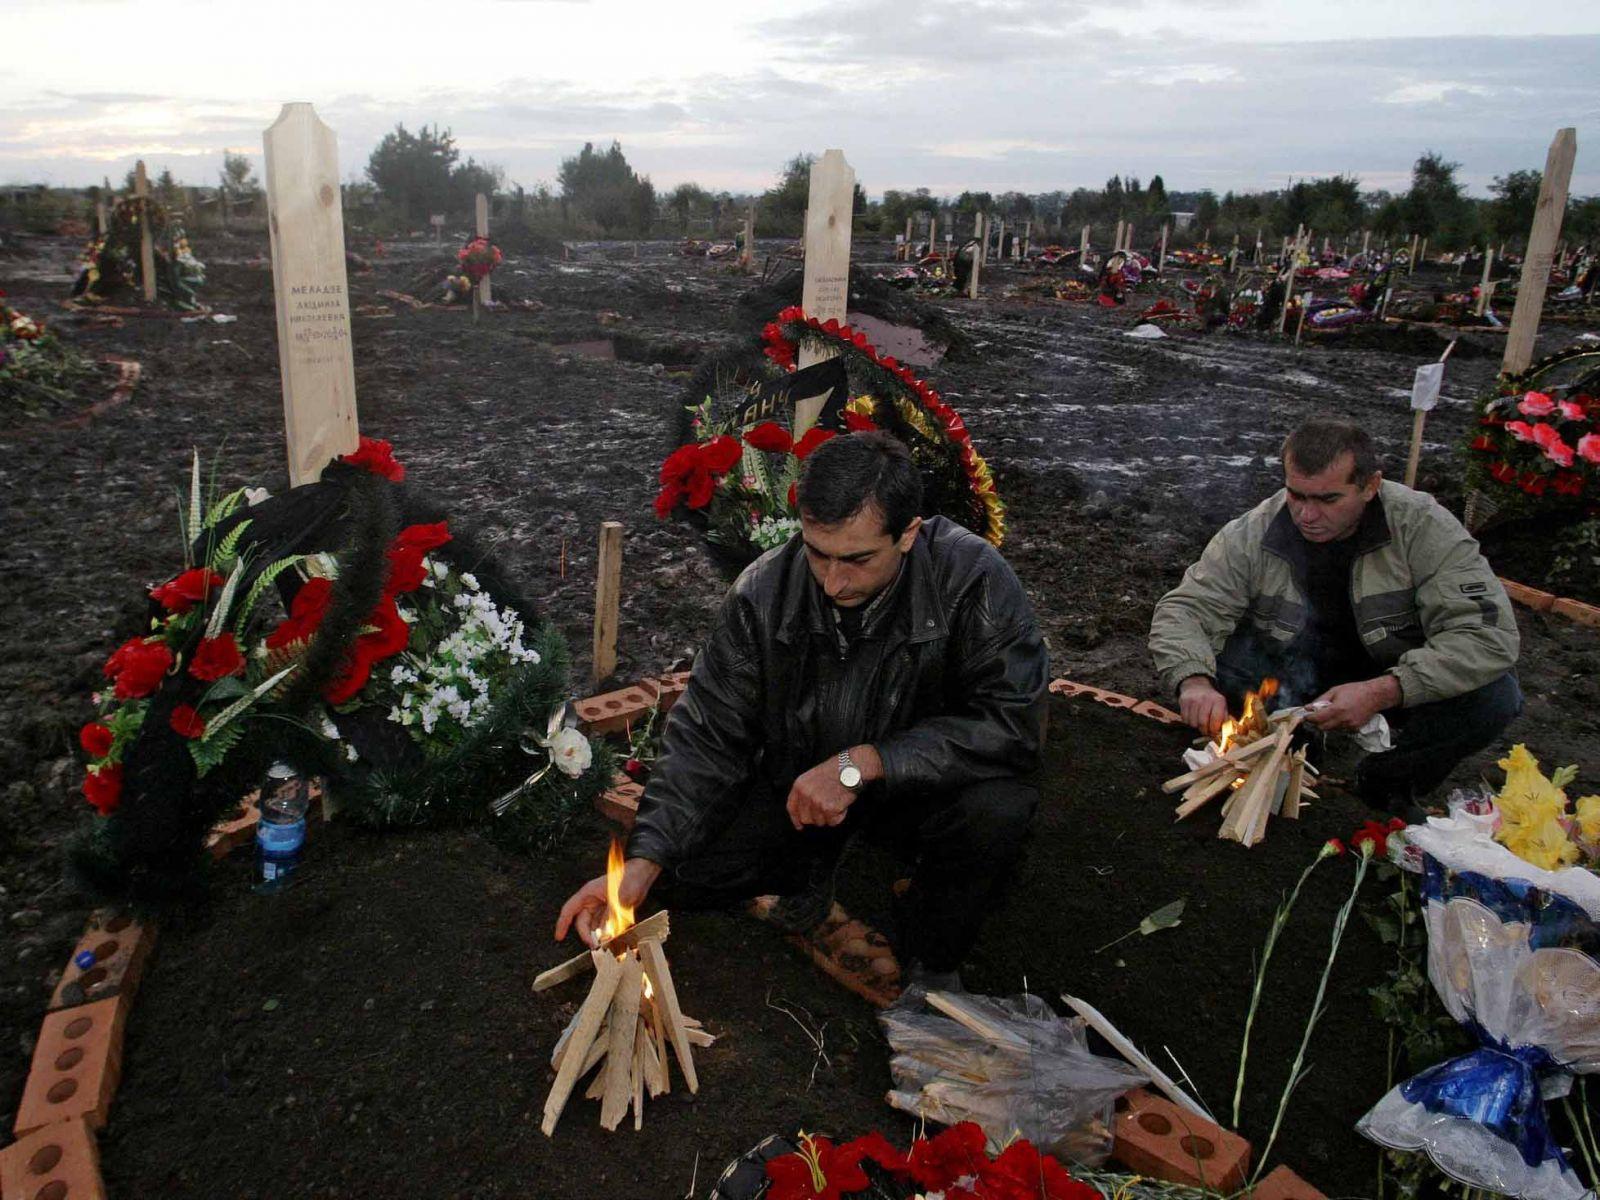 AFP / VIKTOR DRACHEV